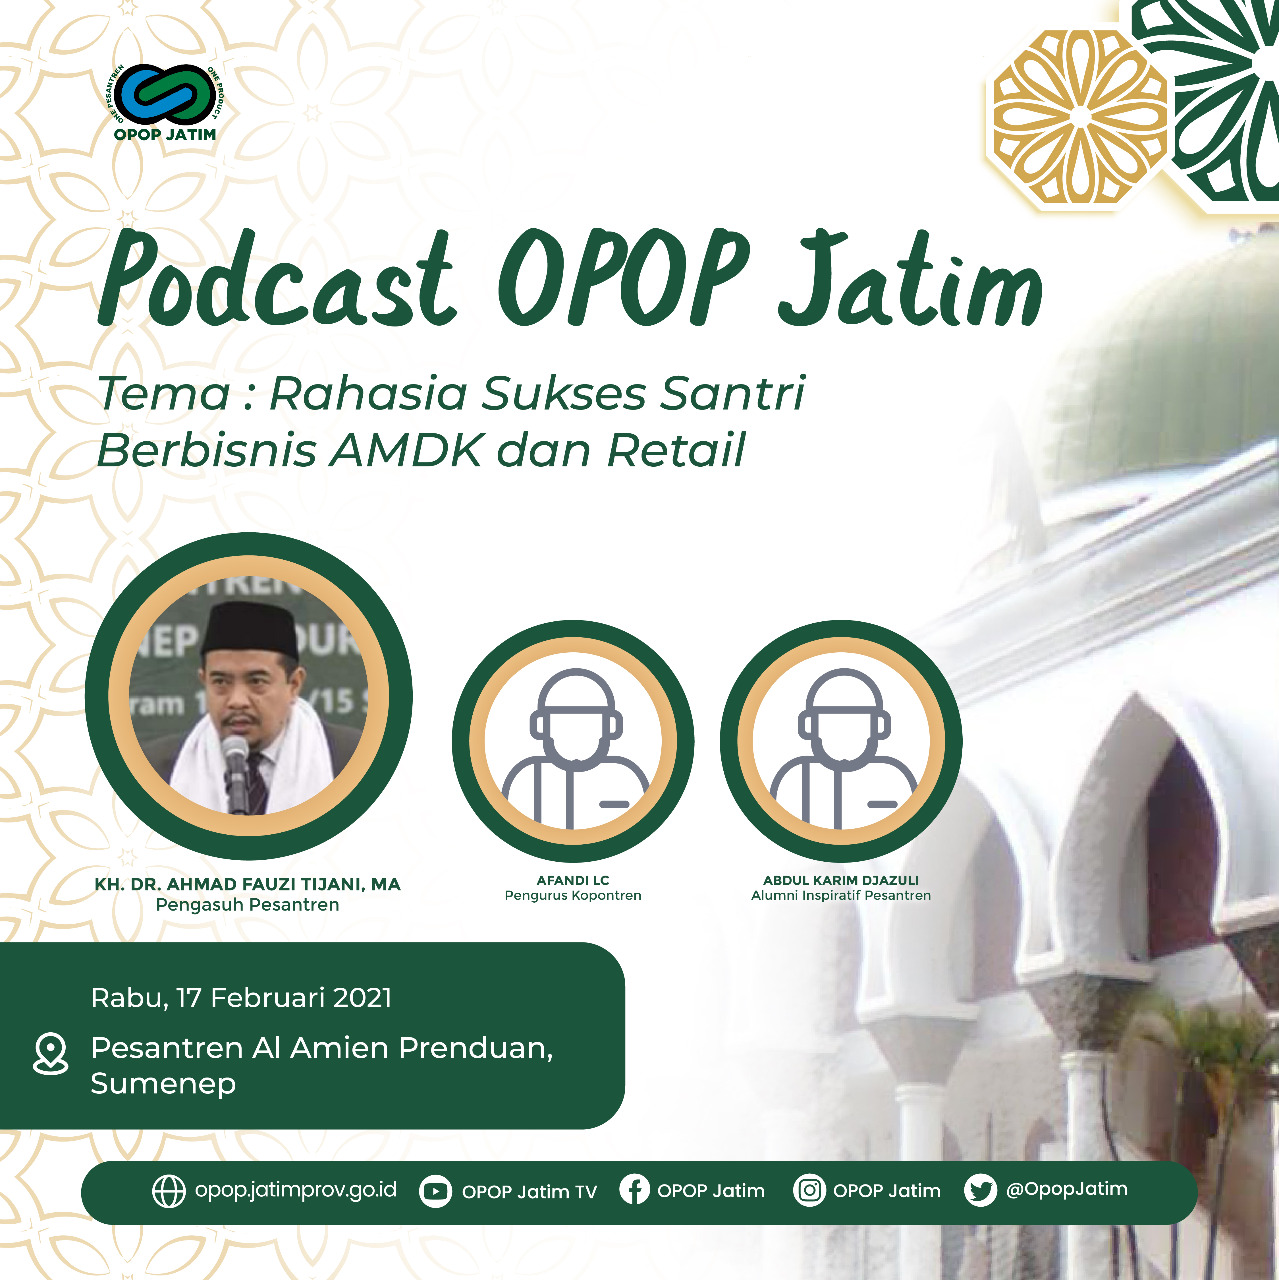 Podcast OPOP 2021 Pesantren Al Amien Prenduan